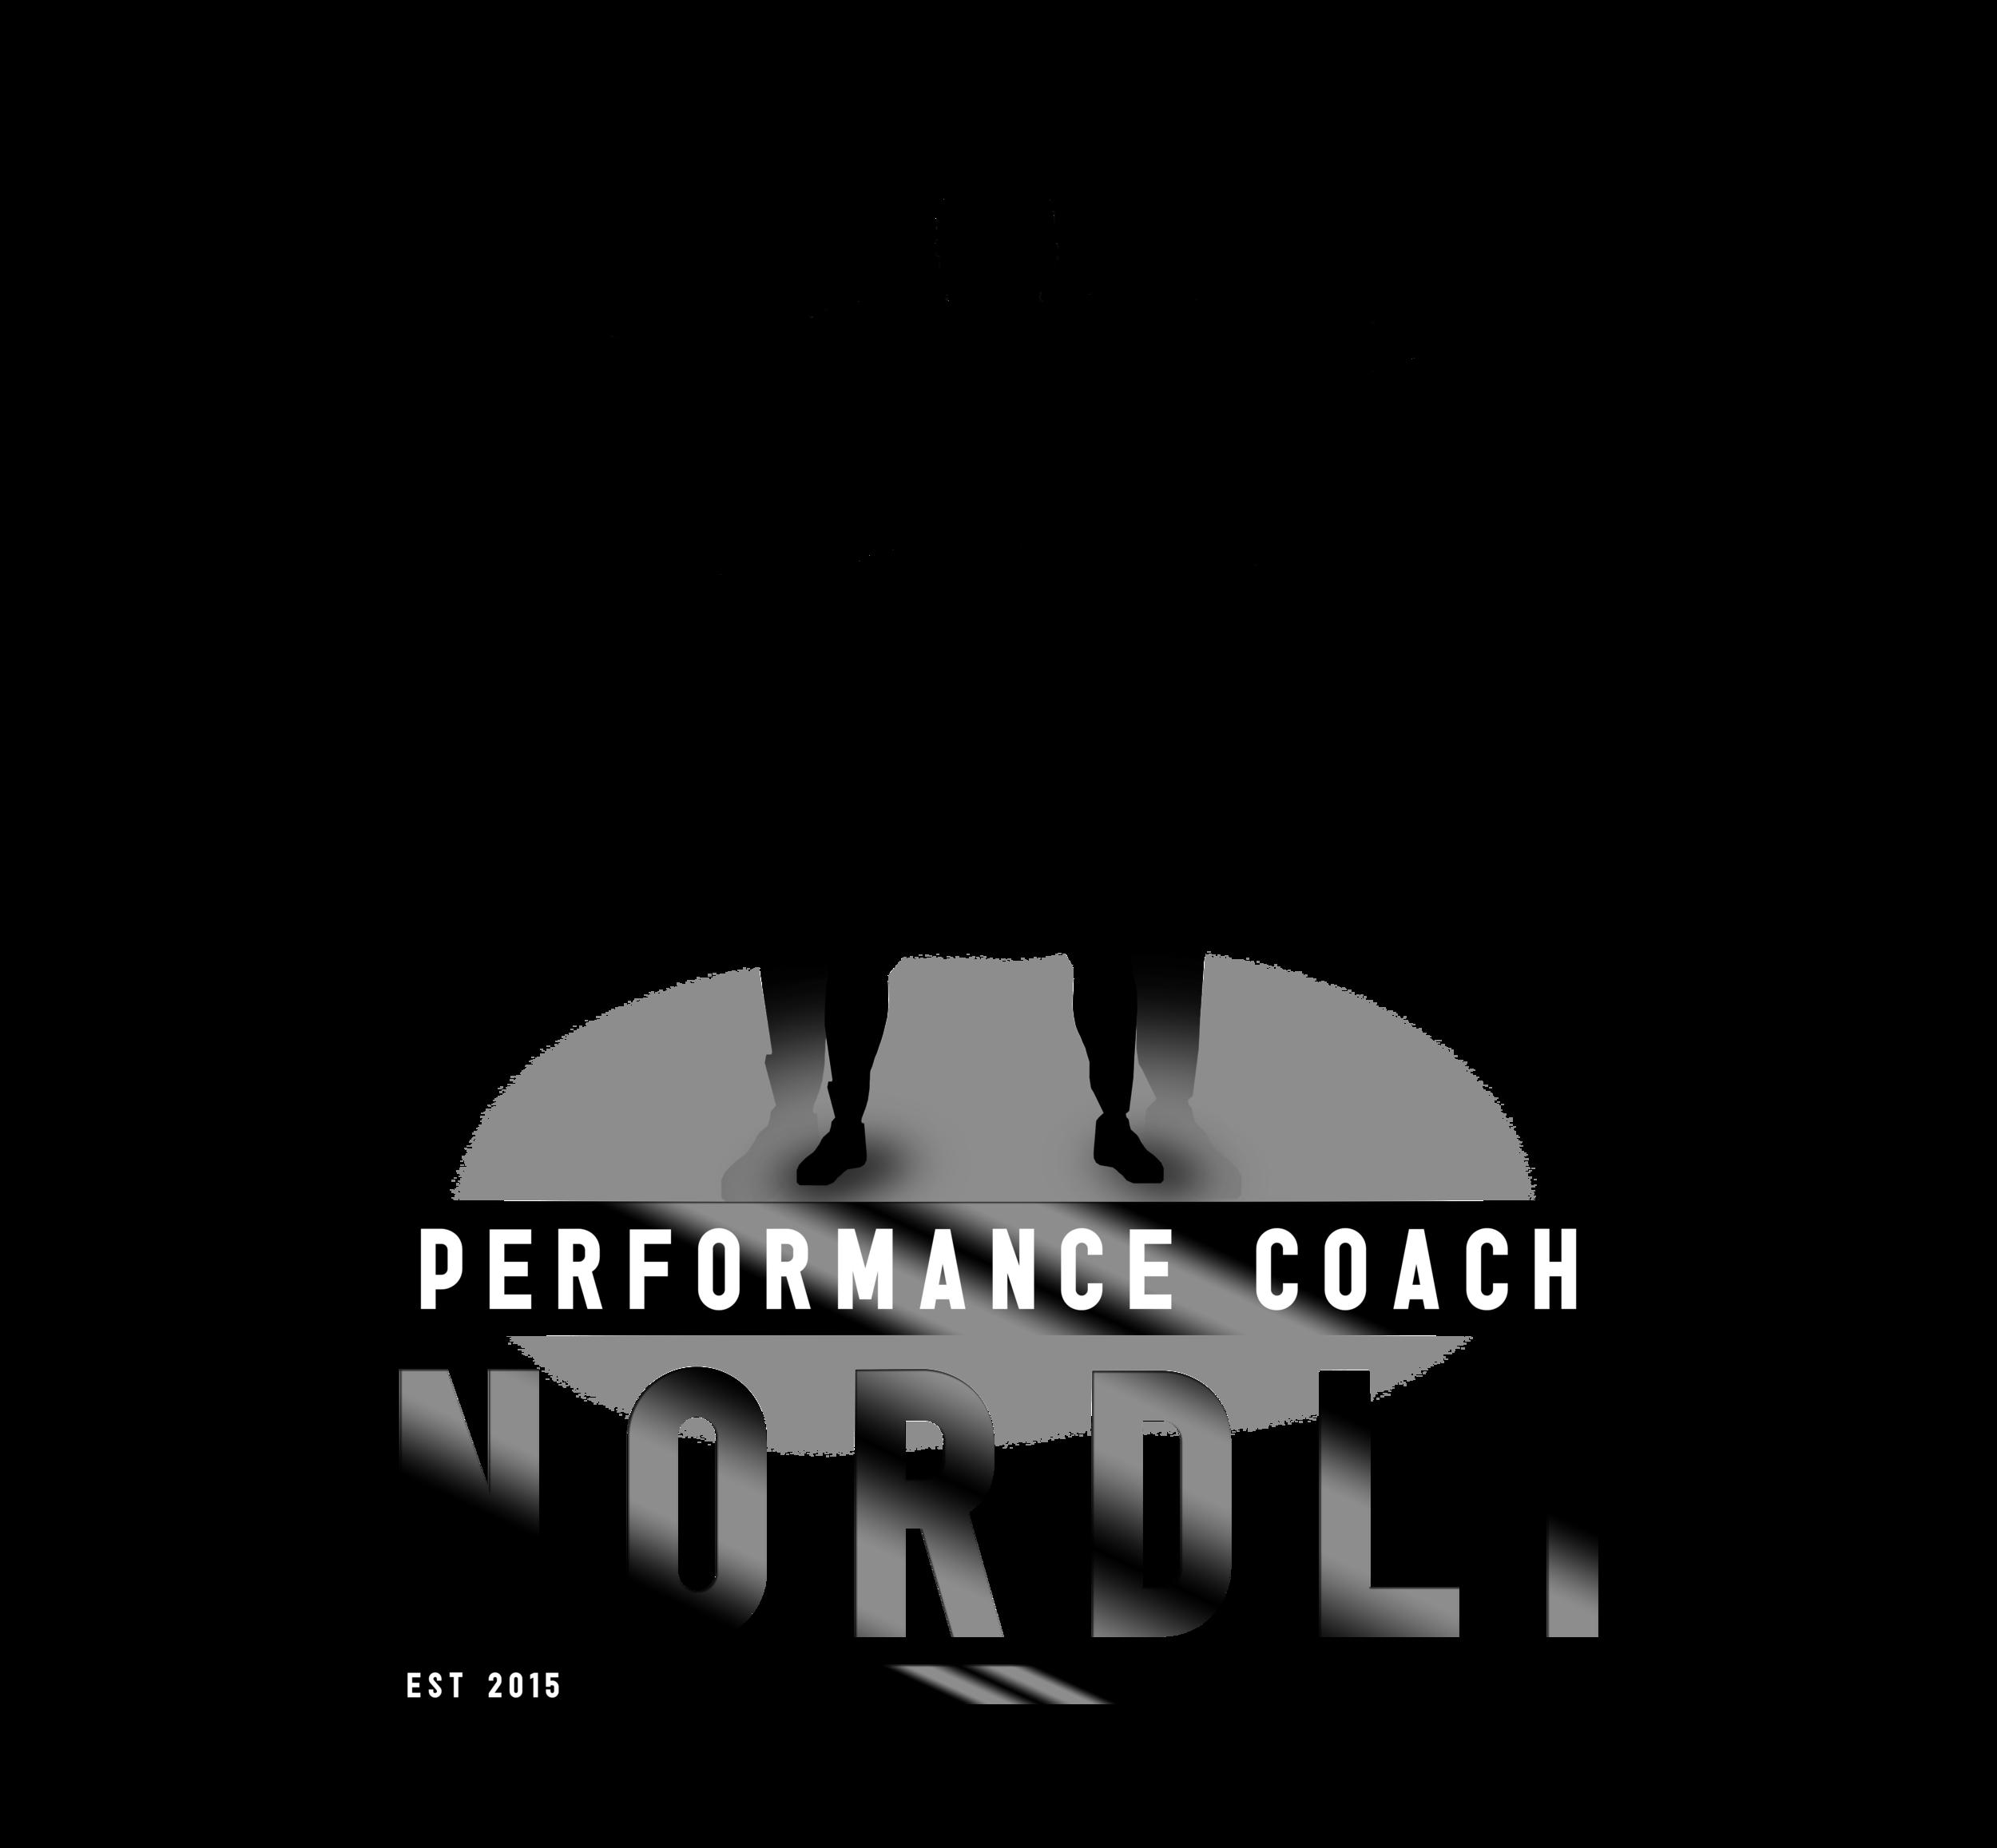 Performance Coach Nordli